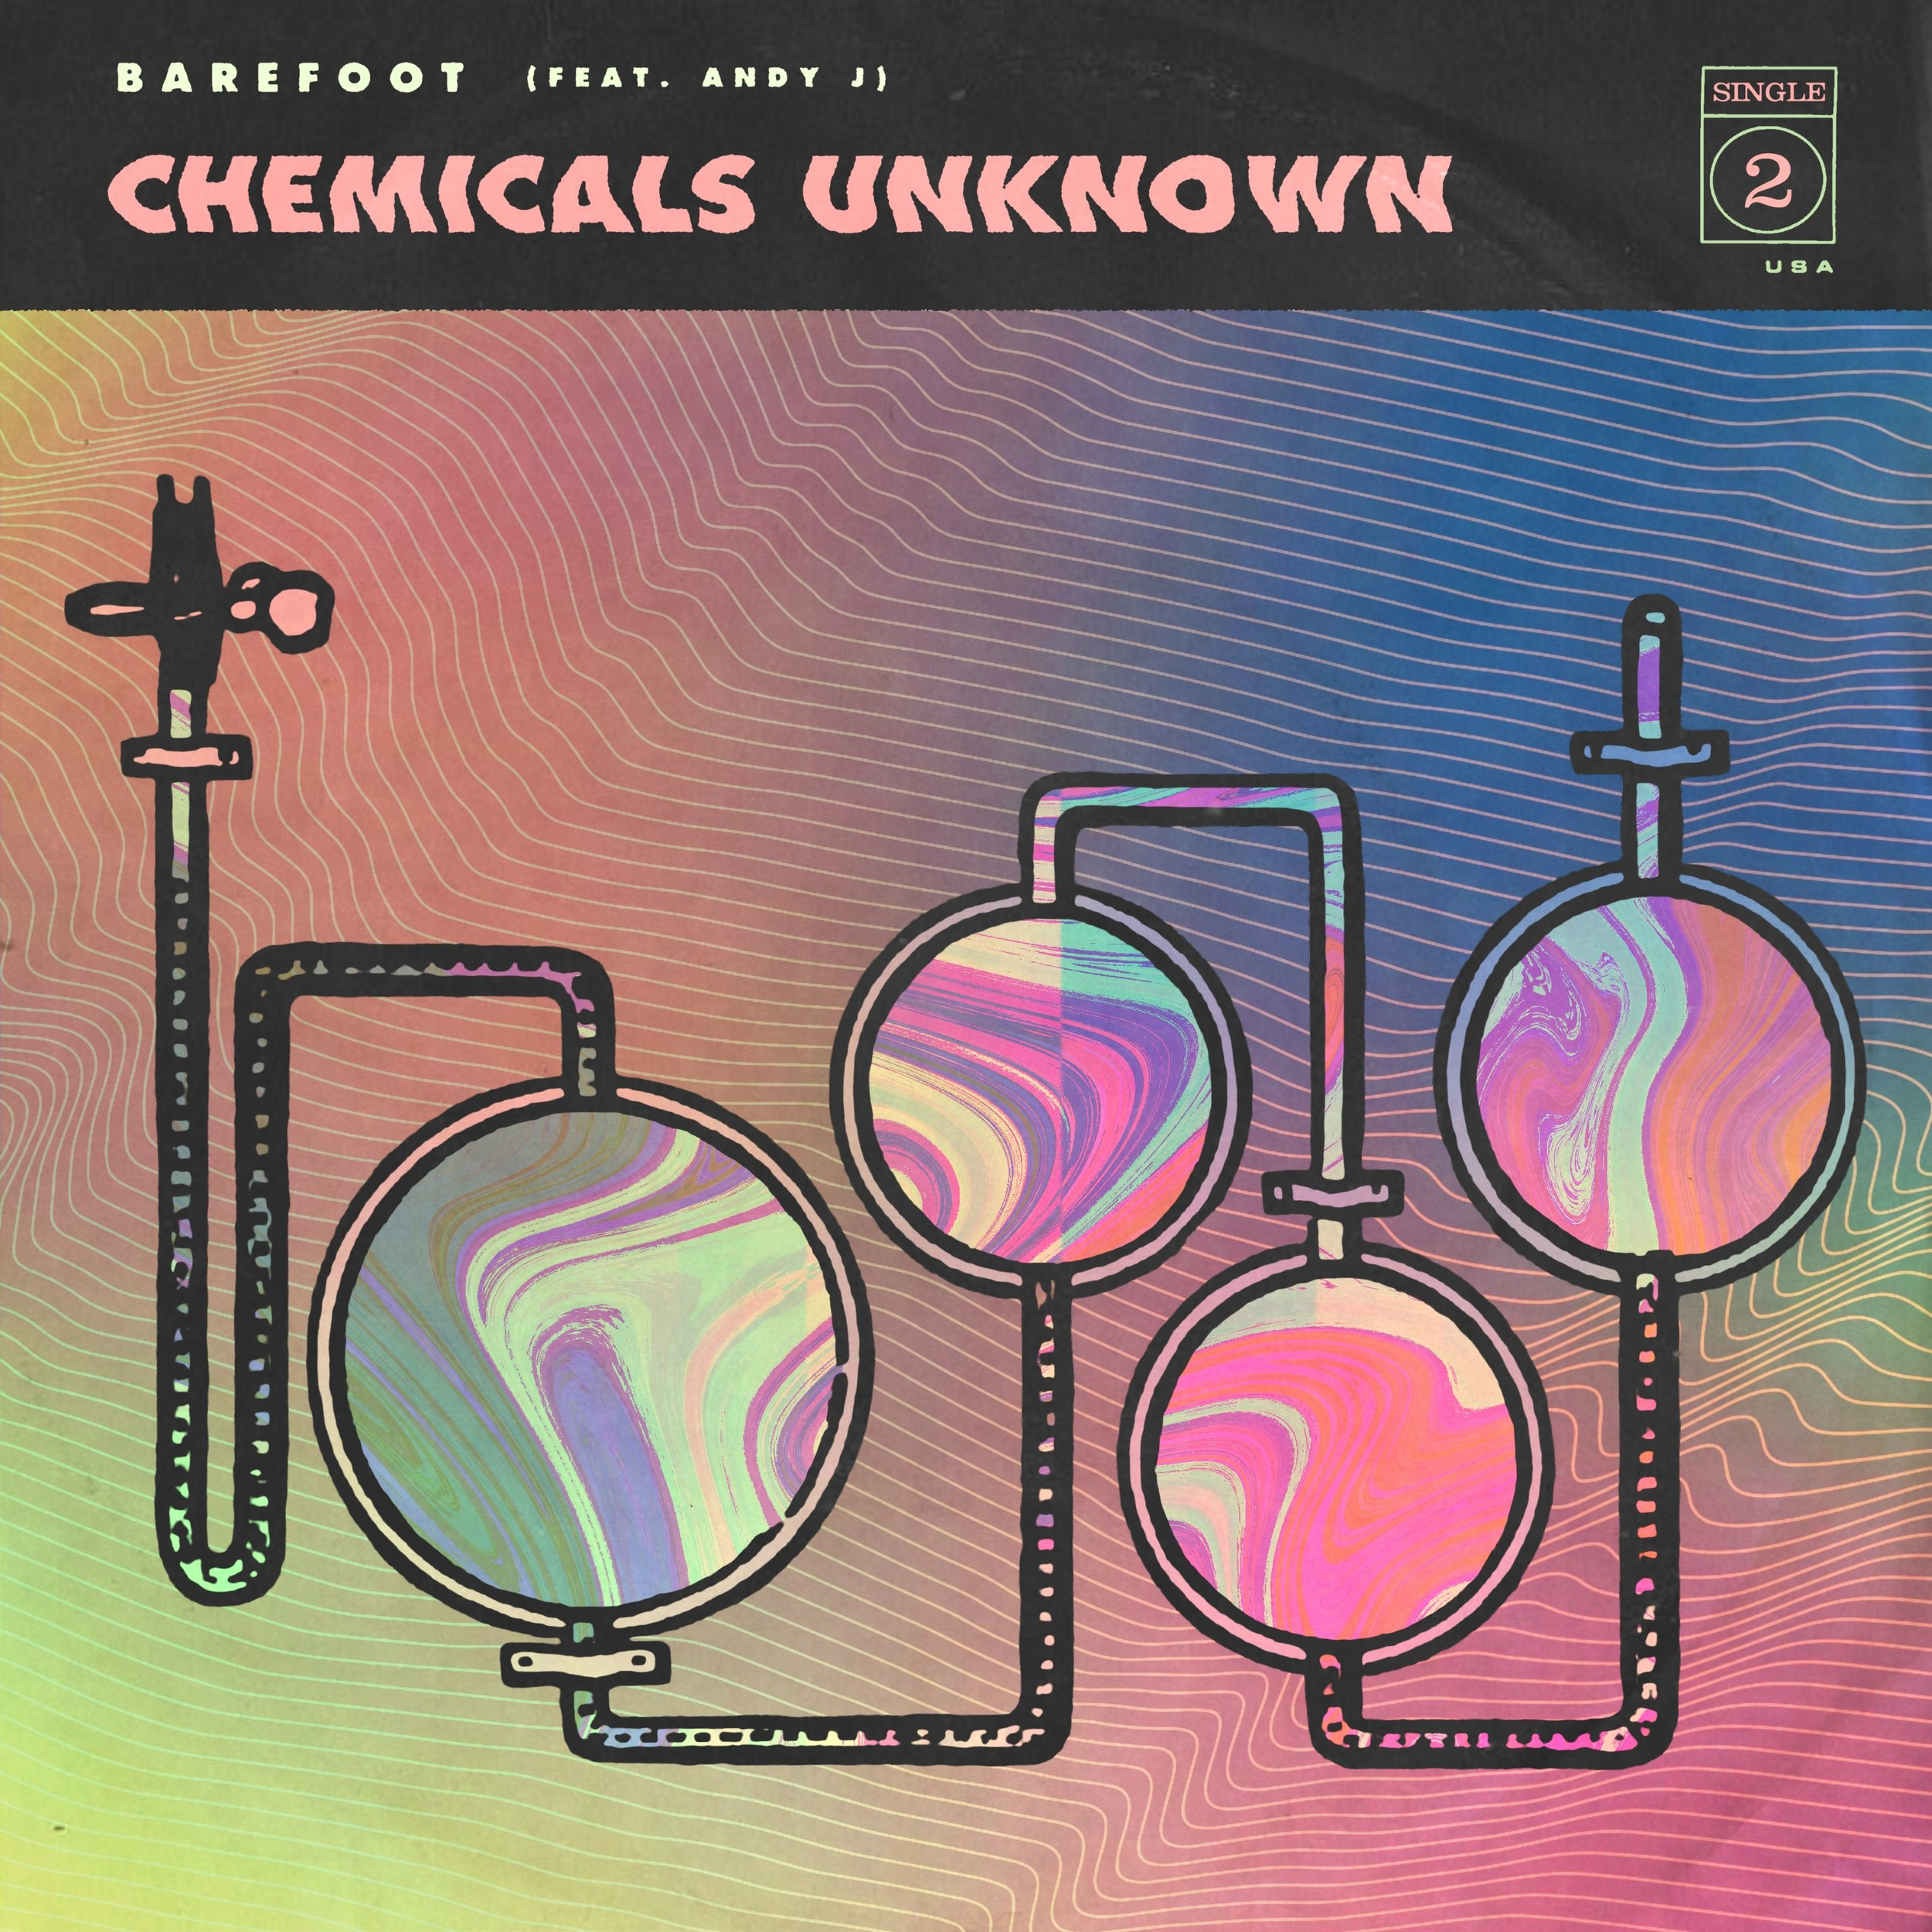 CHEMICALS UNKNOWN 1600x1600 smaller online use.jpg